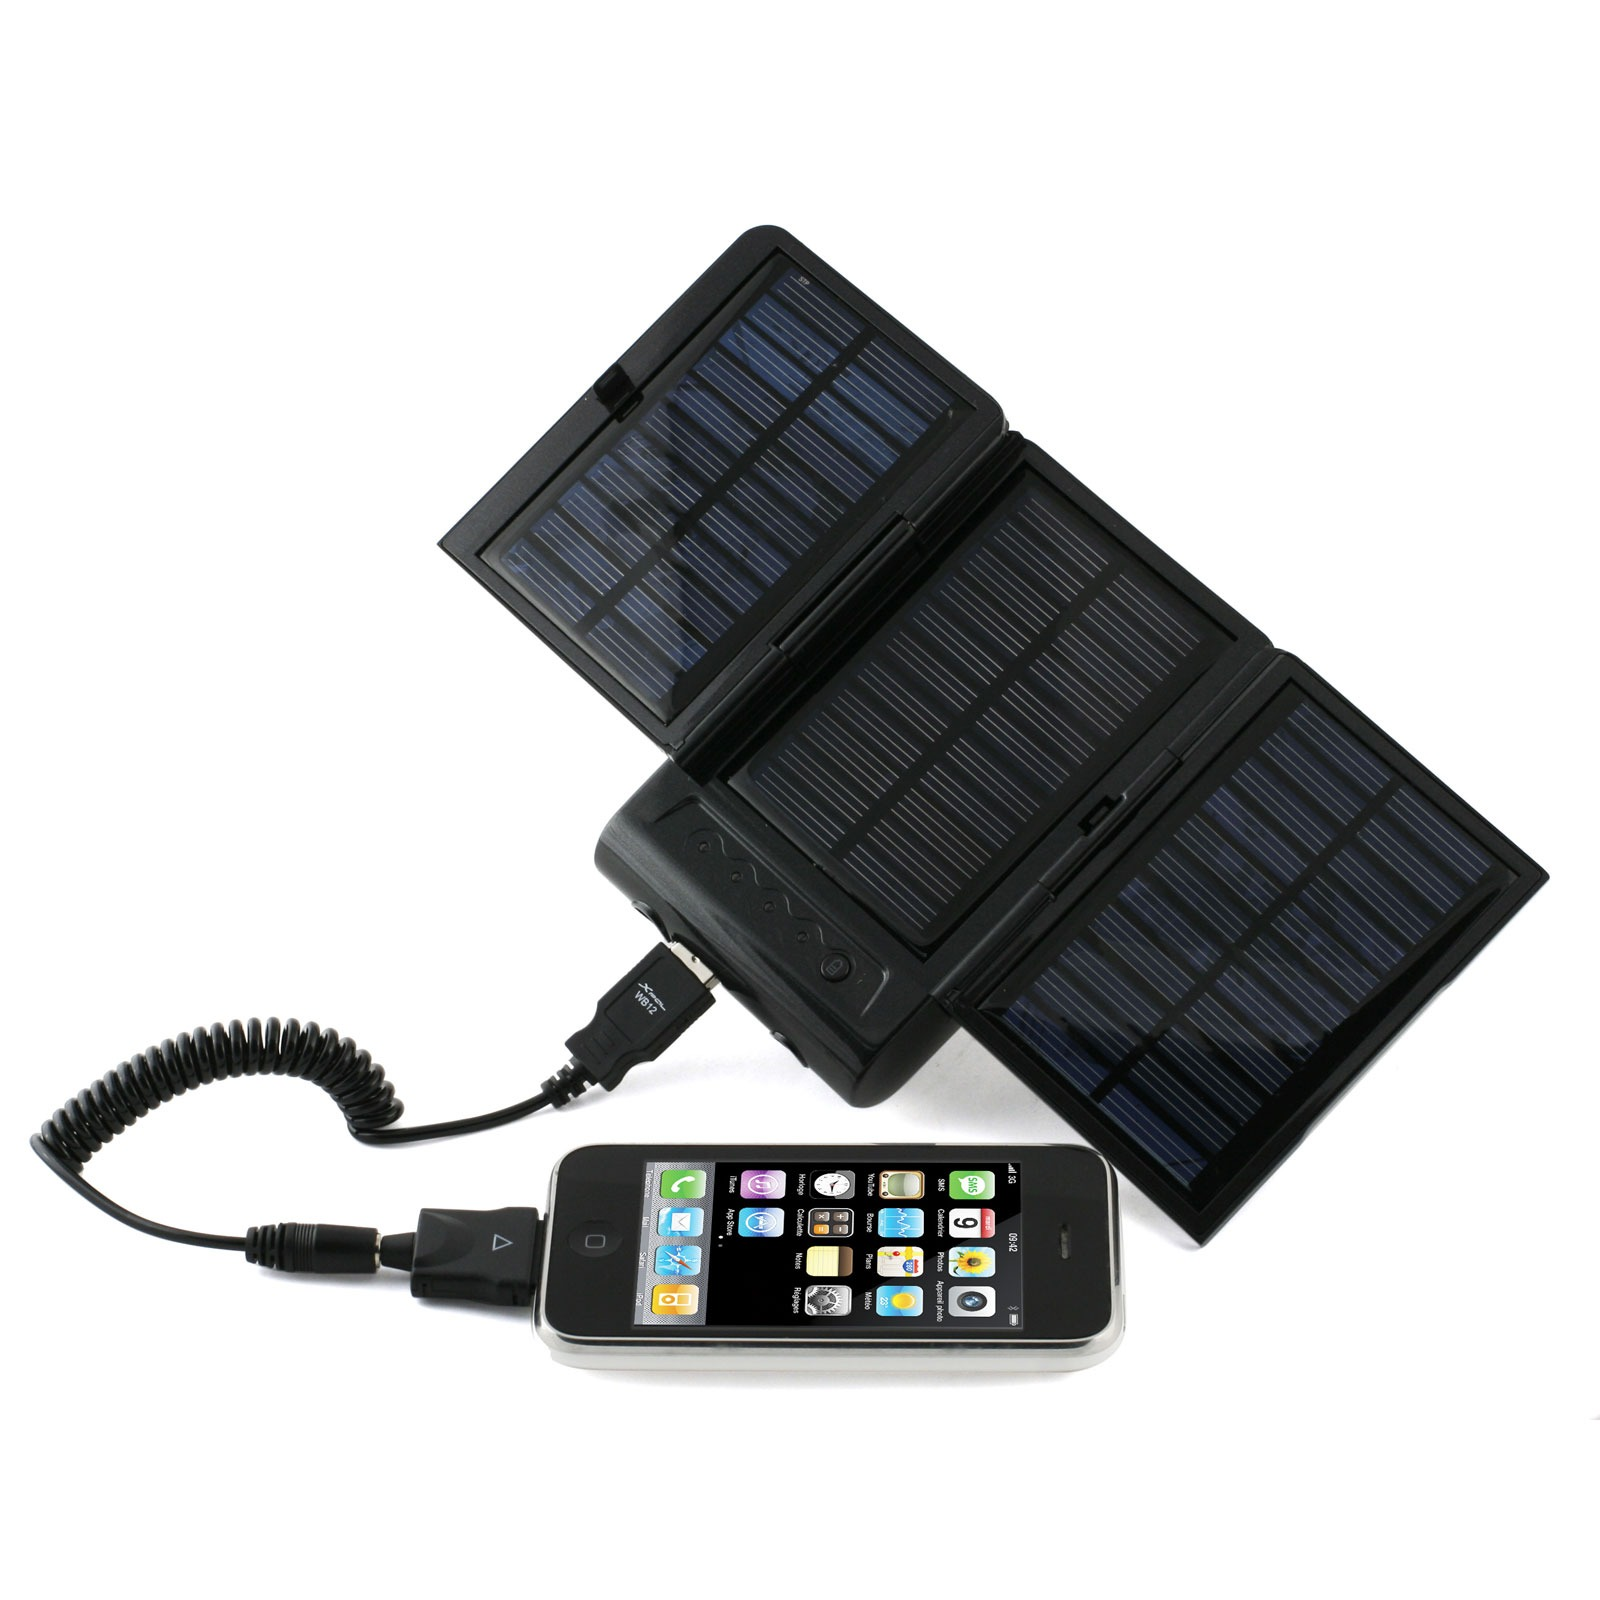 Energizer Powerbank Sp2000 Chargeur T 233 L 233 Phone Energizer